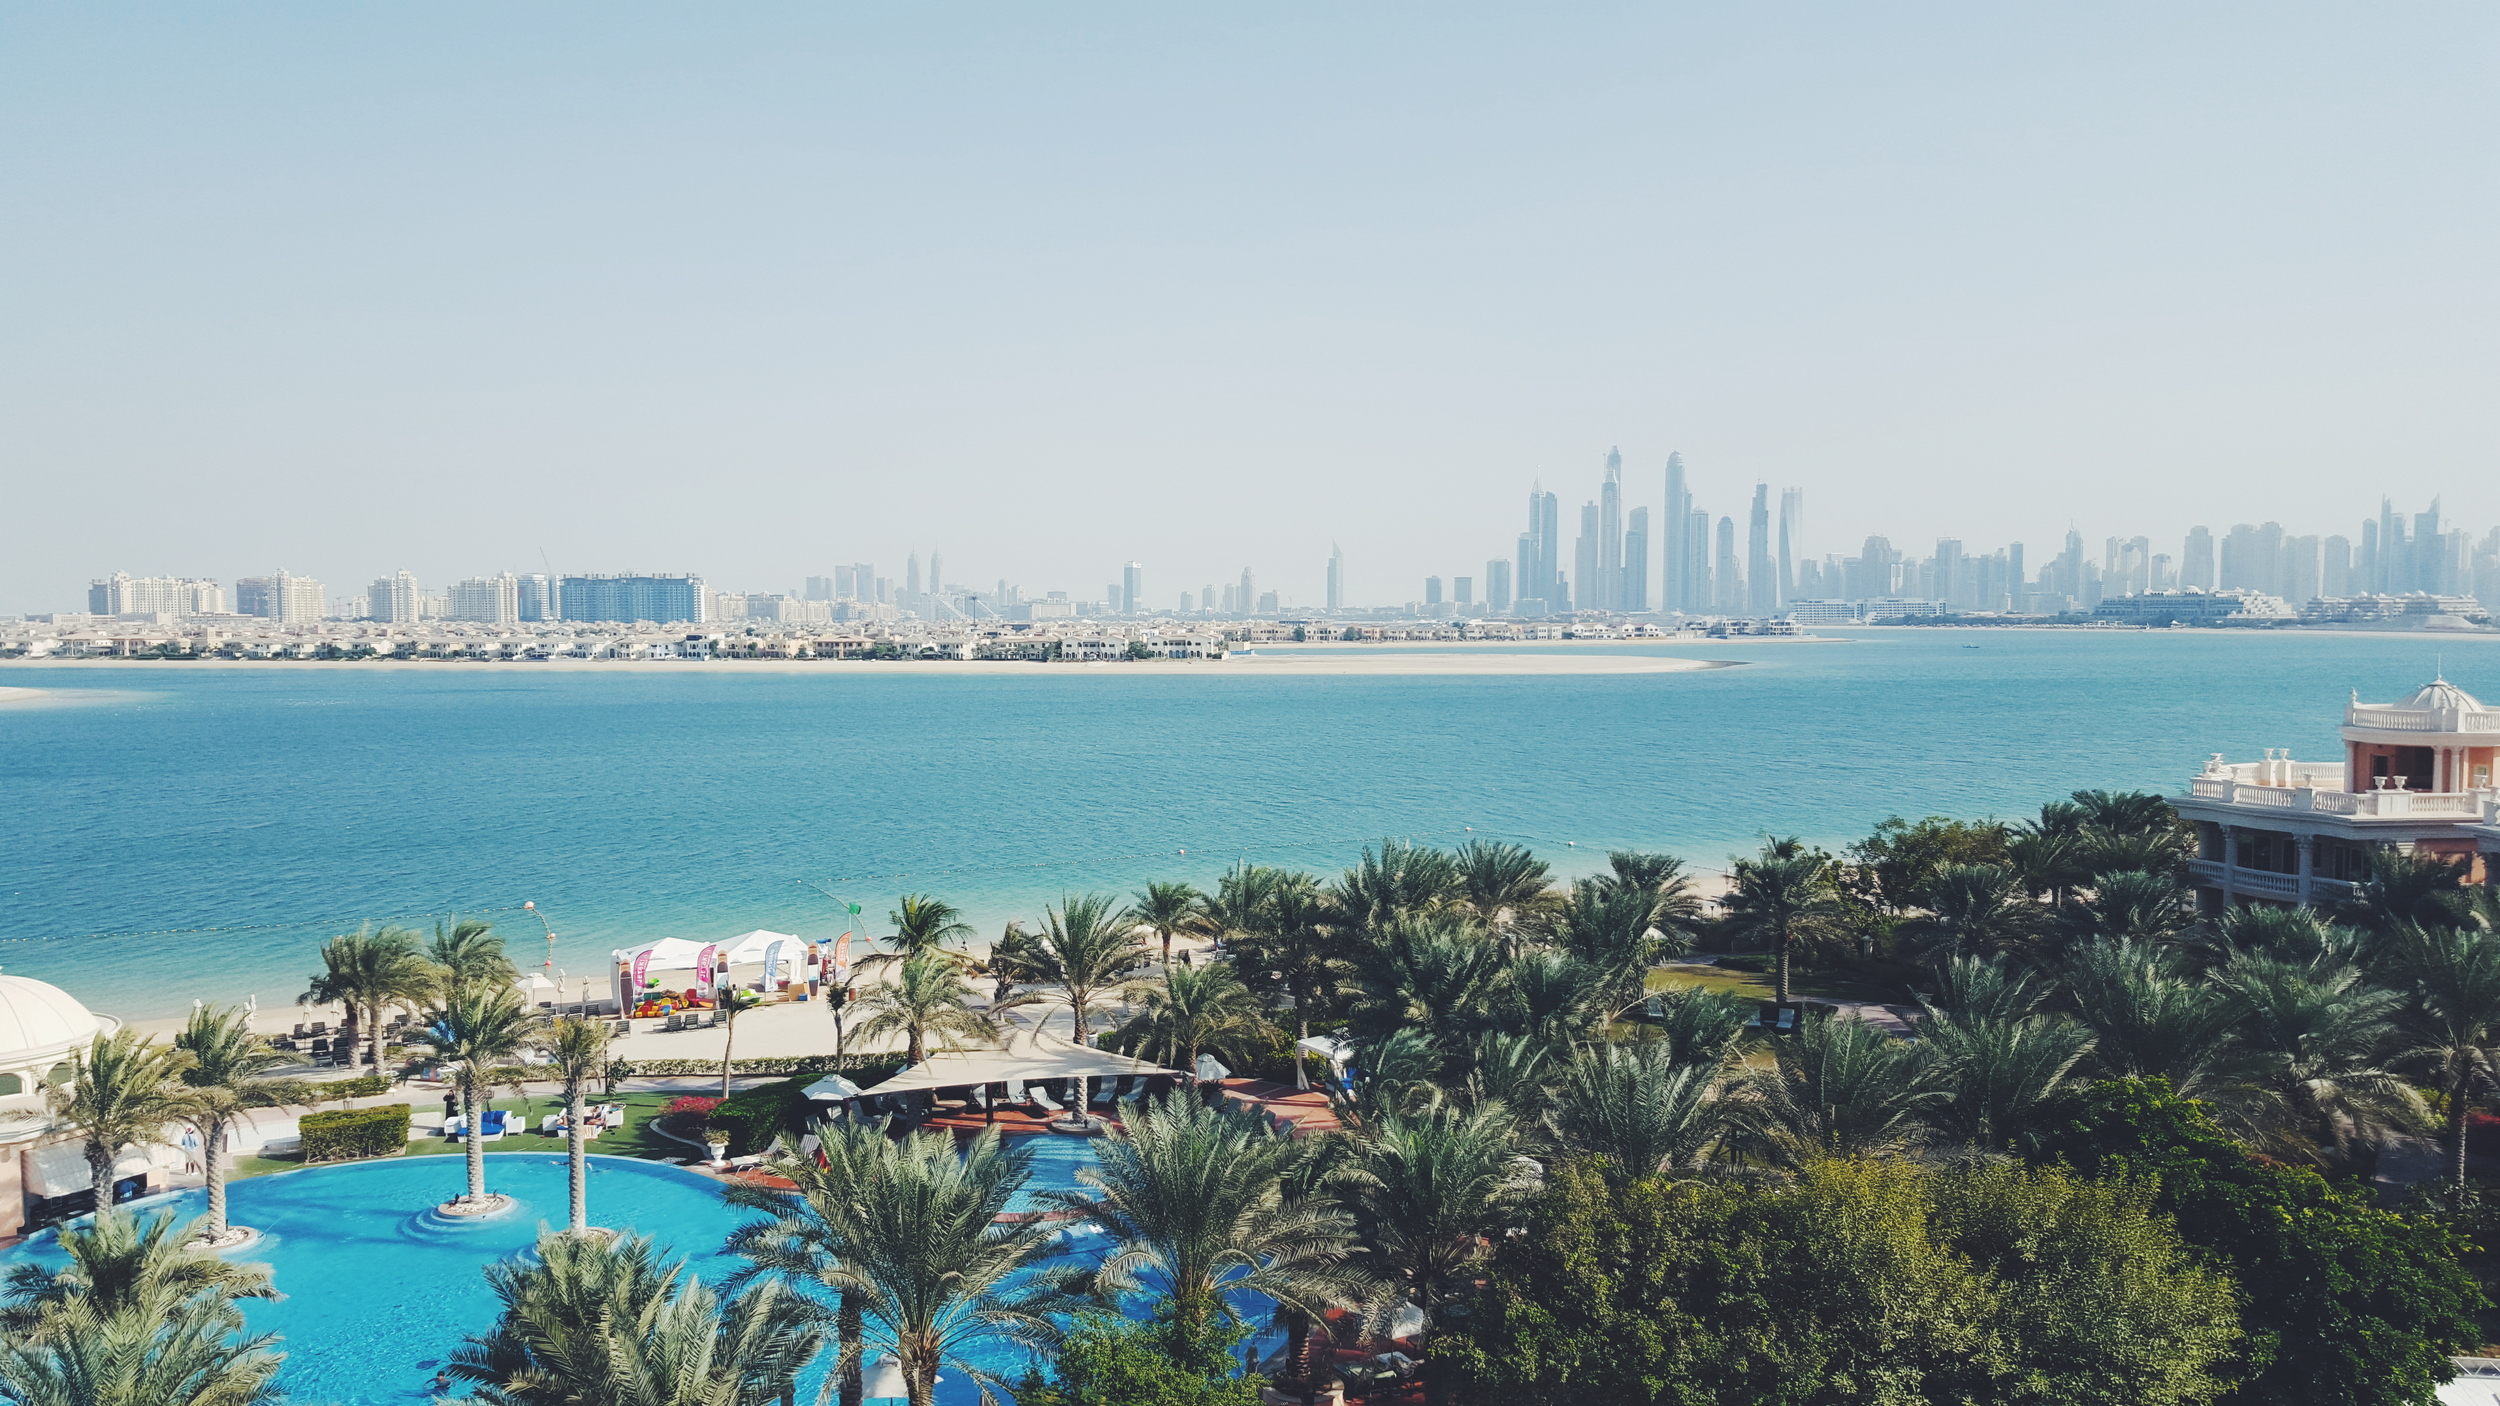 Carelle - Dubai 2015